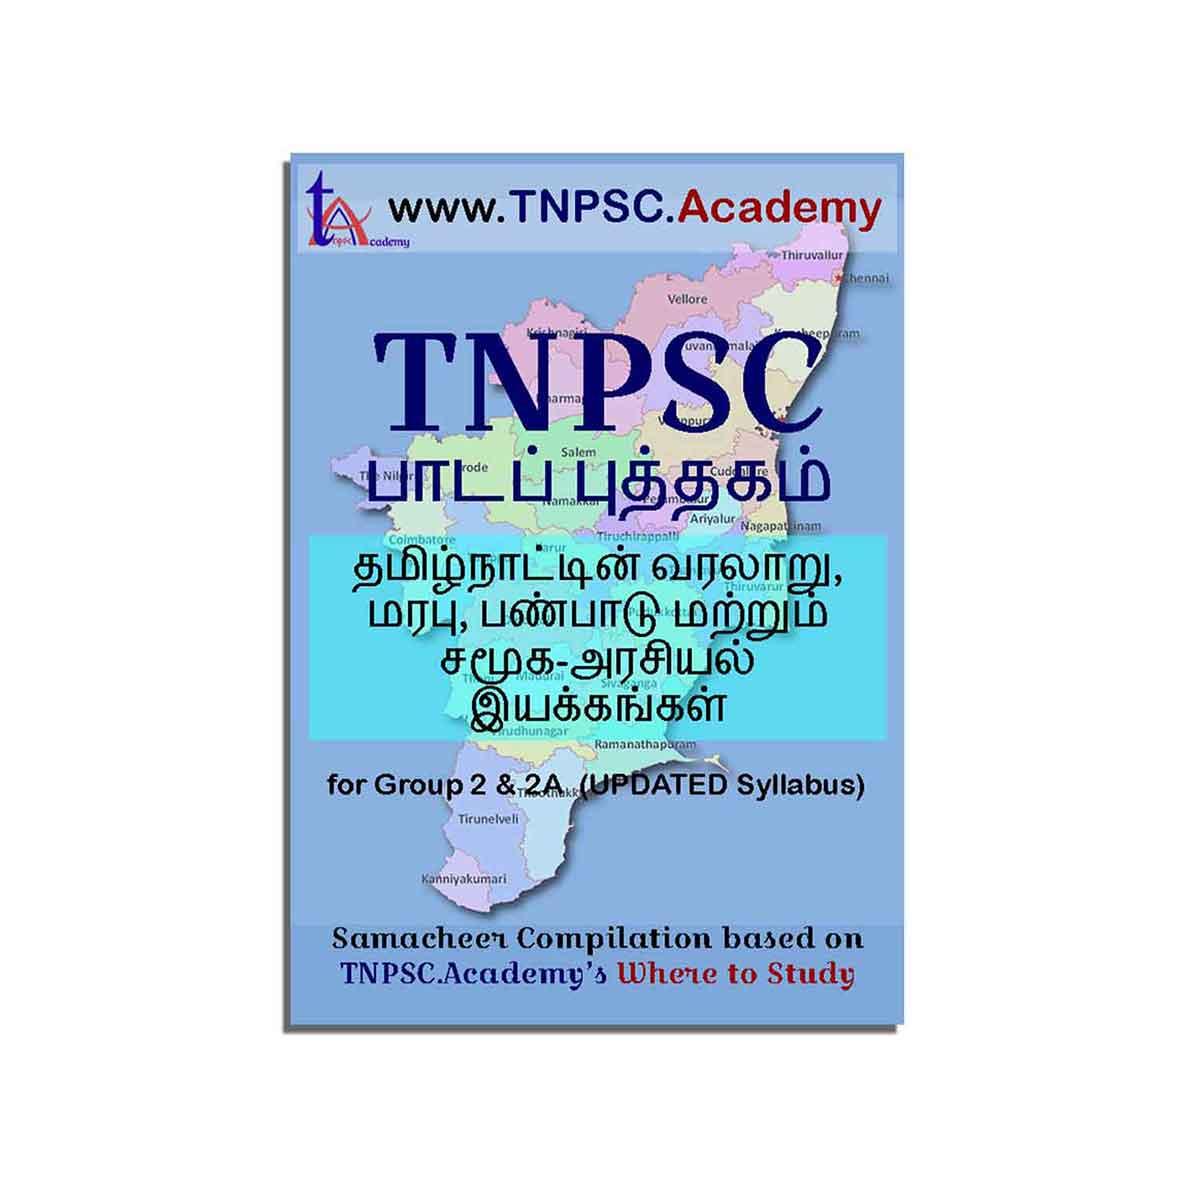 TNPSC Culture, Heritage in Tamil